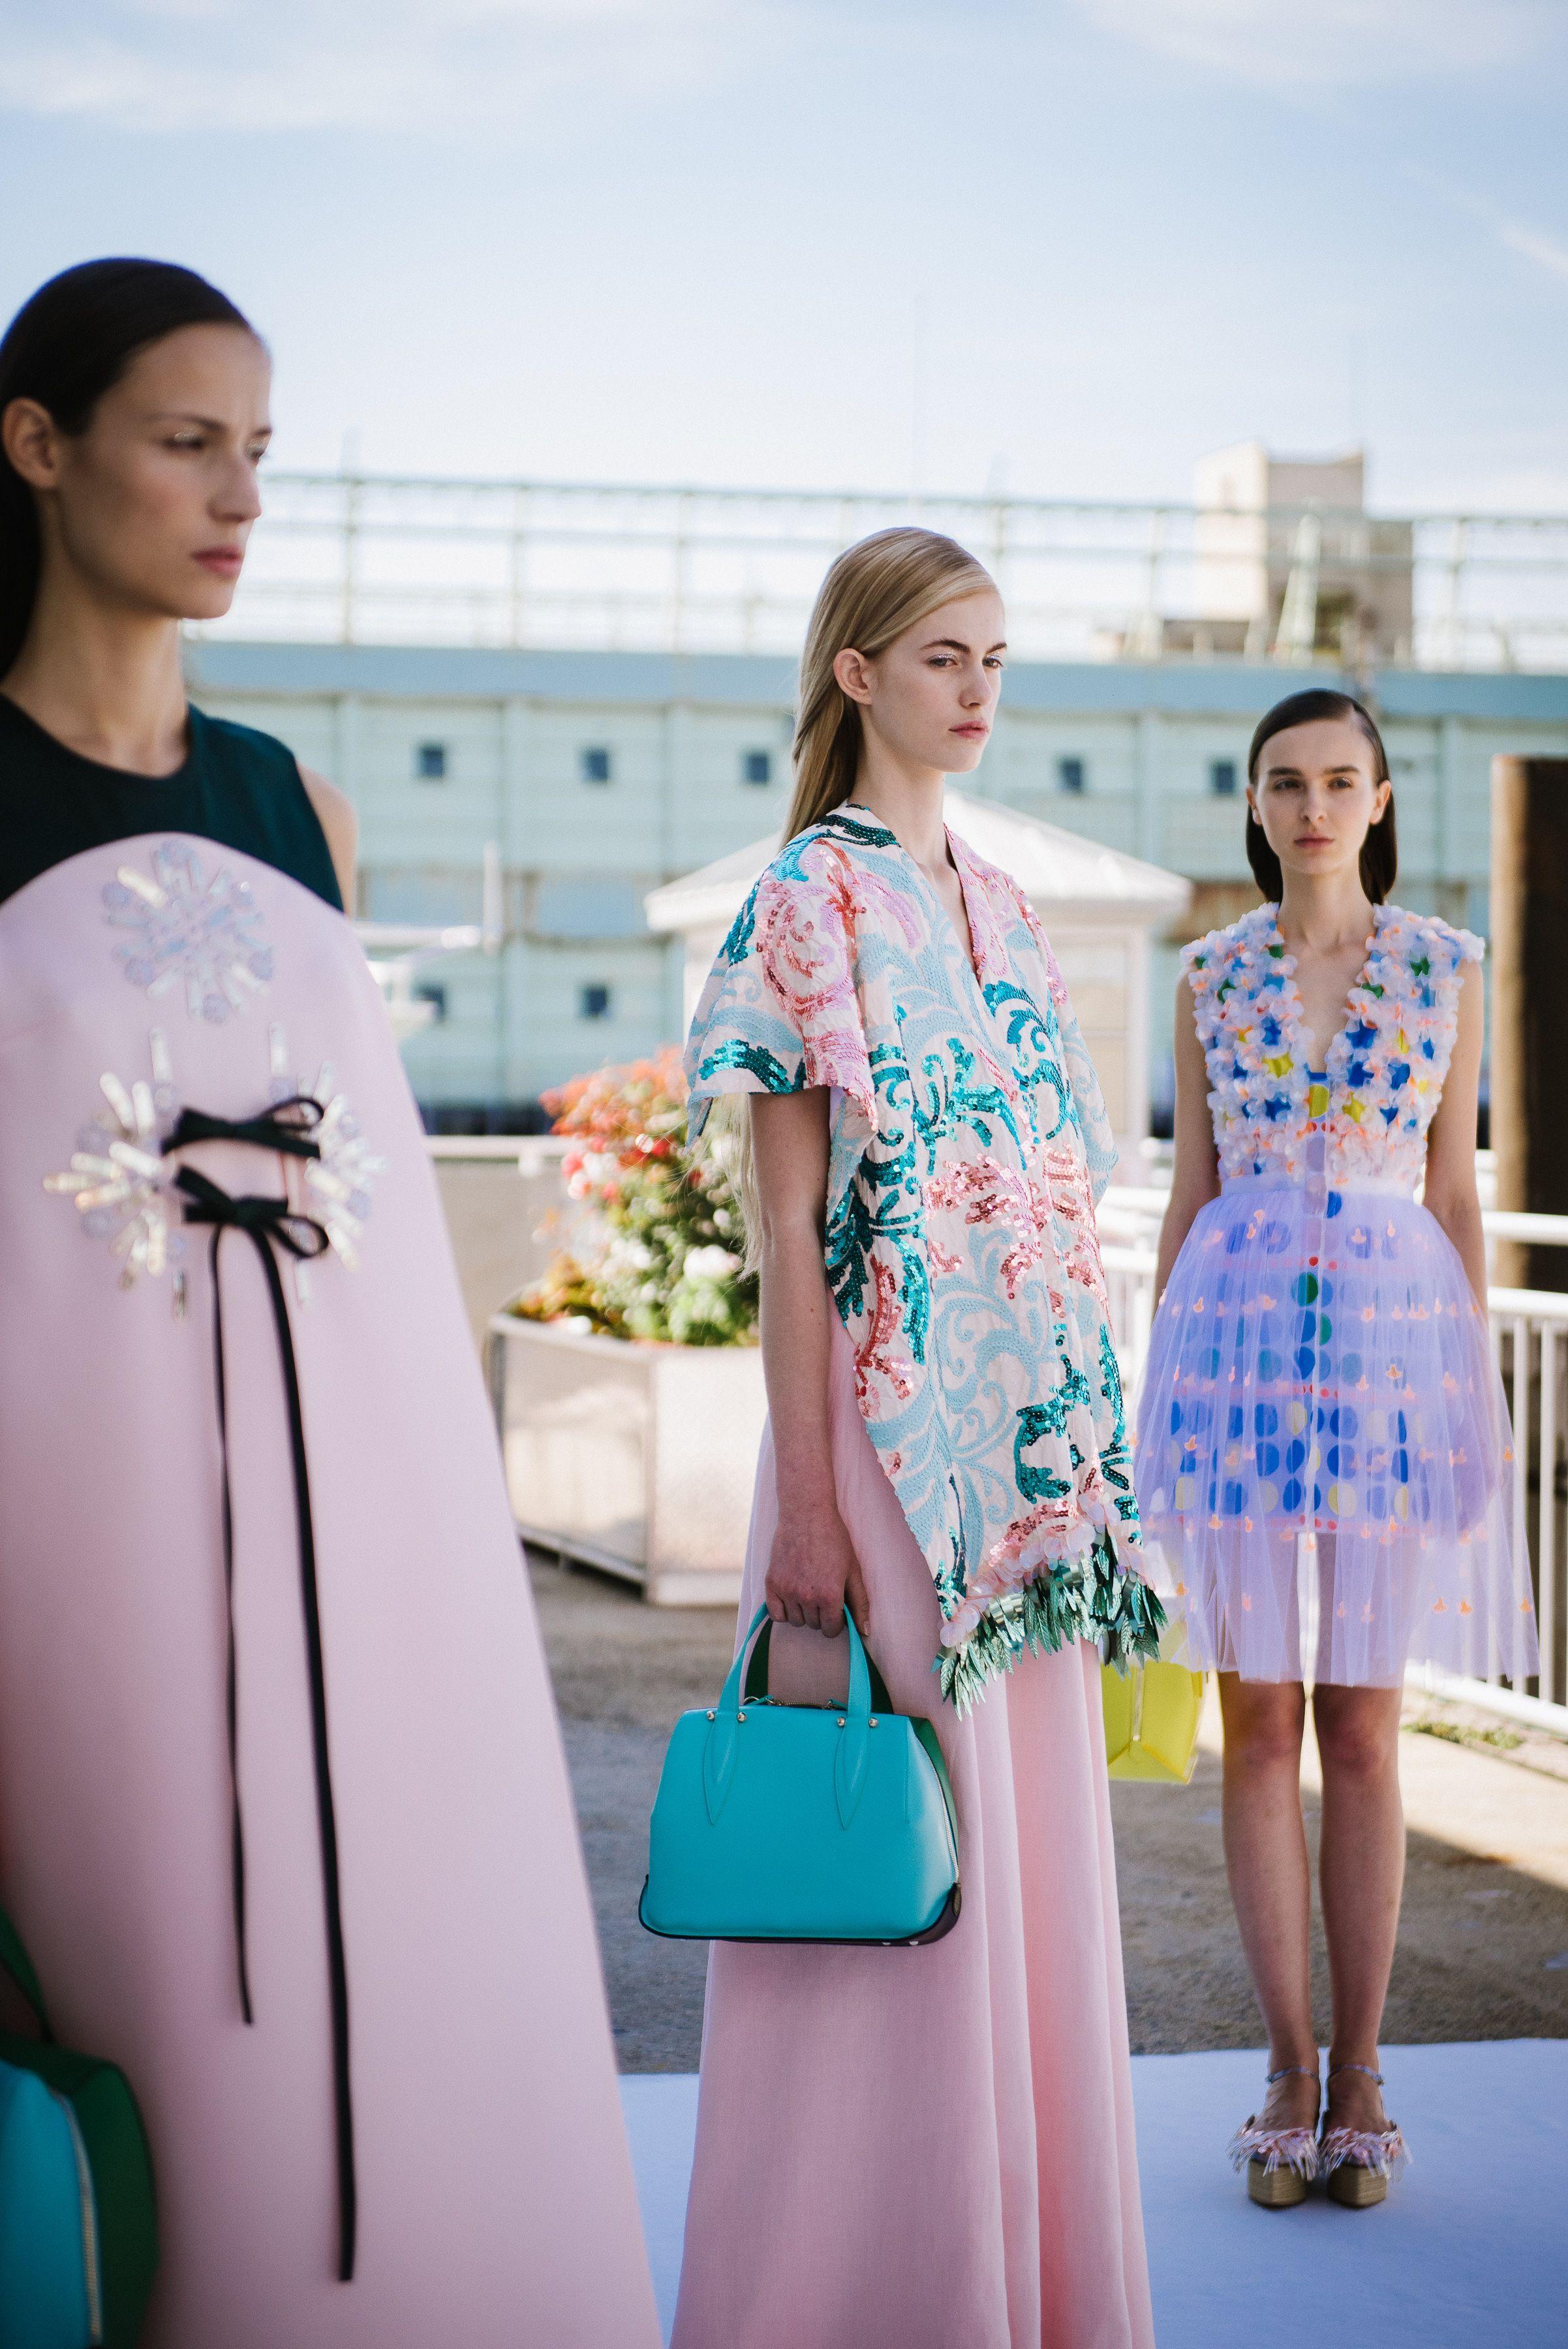 Pin de Karen McCreary en Delpozo | Pinterest | El pozo, Moda ...